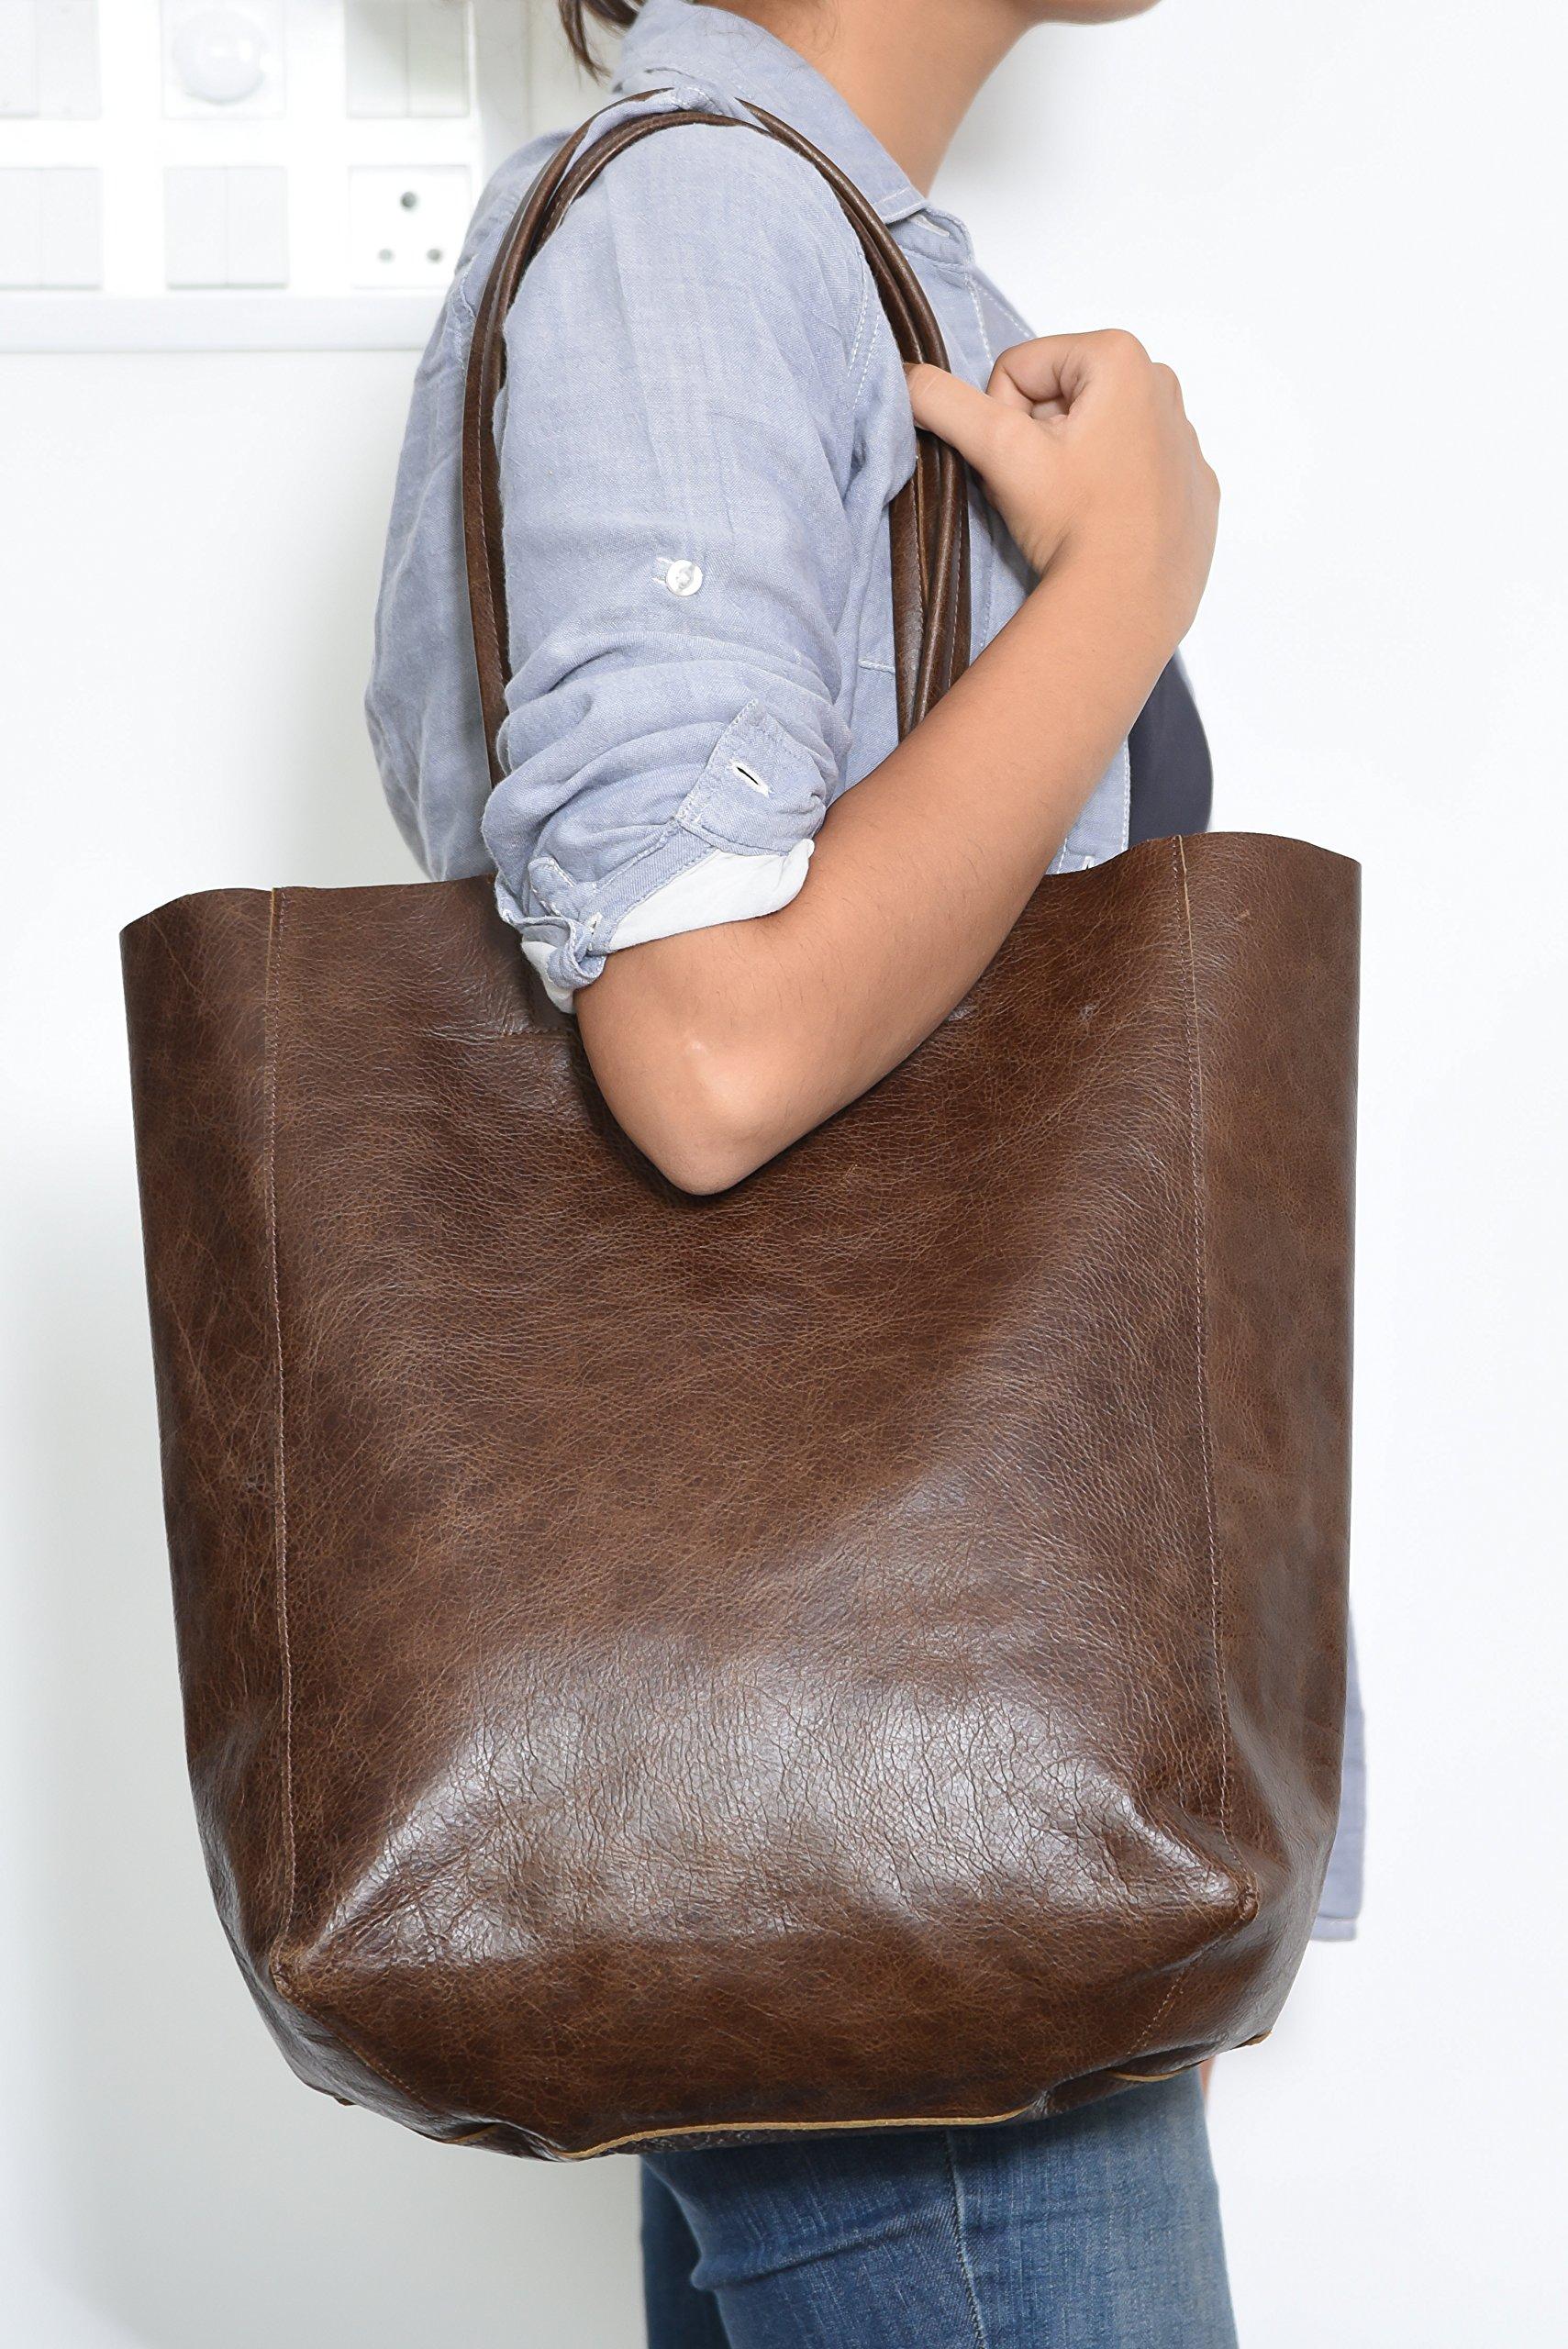 Women's Vintage Genuine Leather Tote Shoulder Bag - Large Capacity Travel Handbag by THE AARTISAN (Image #4)